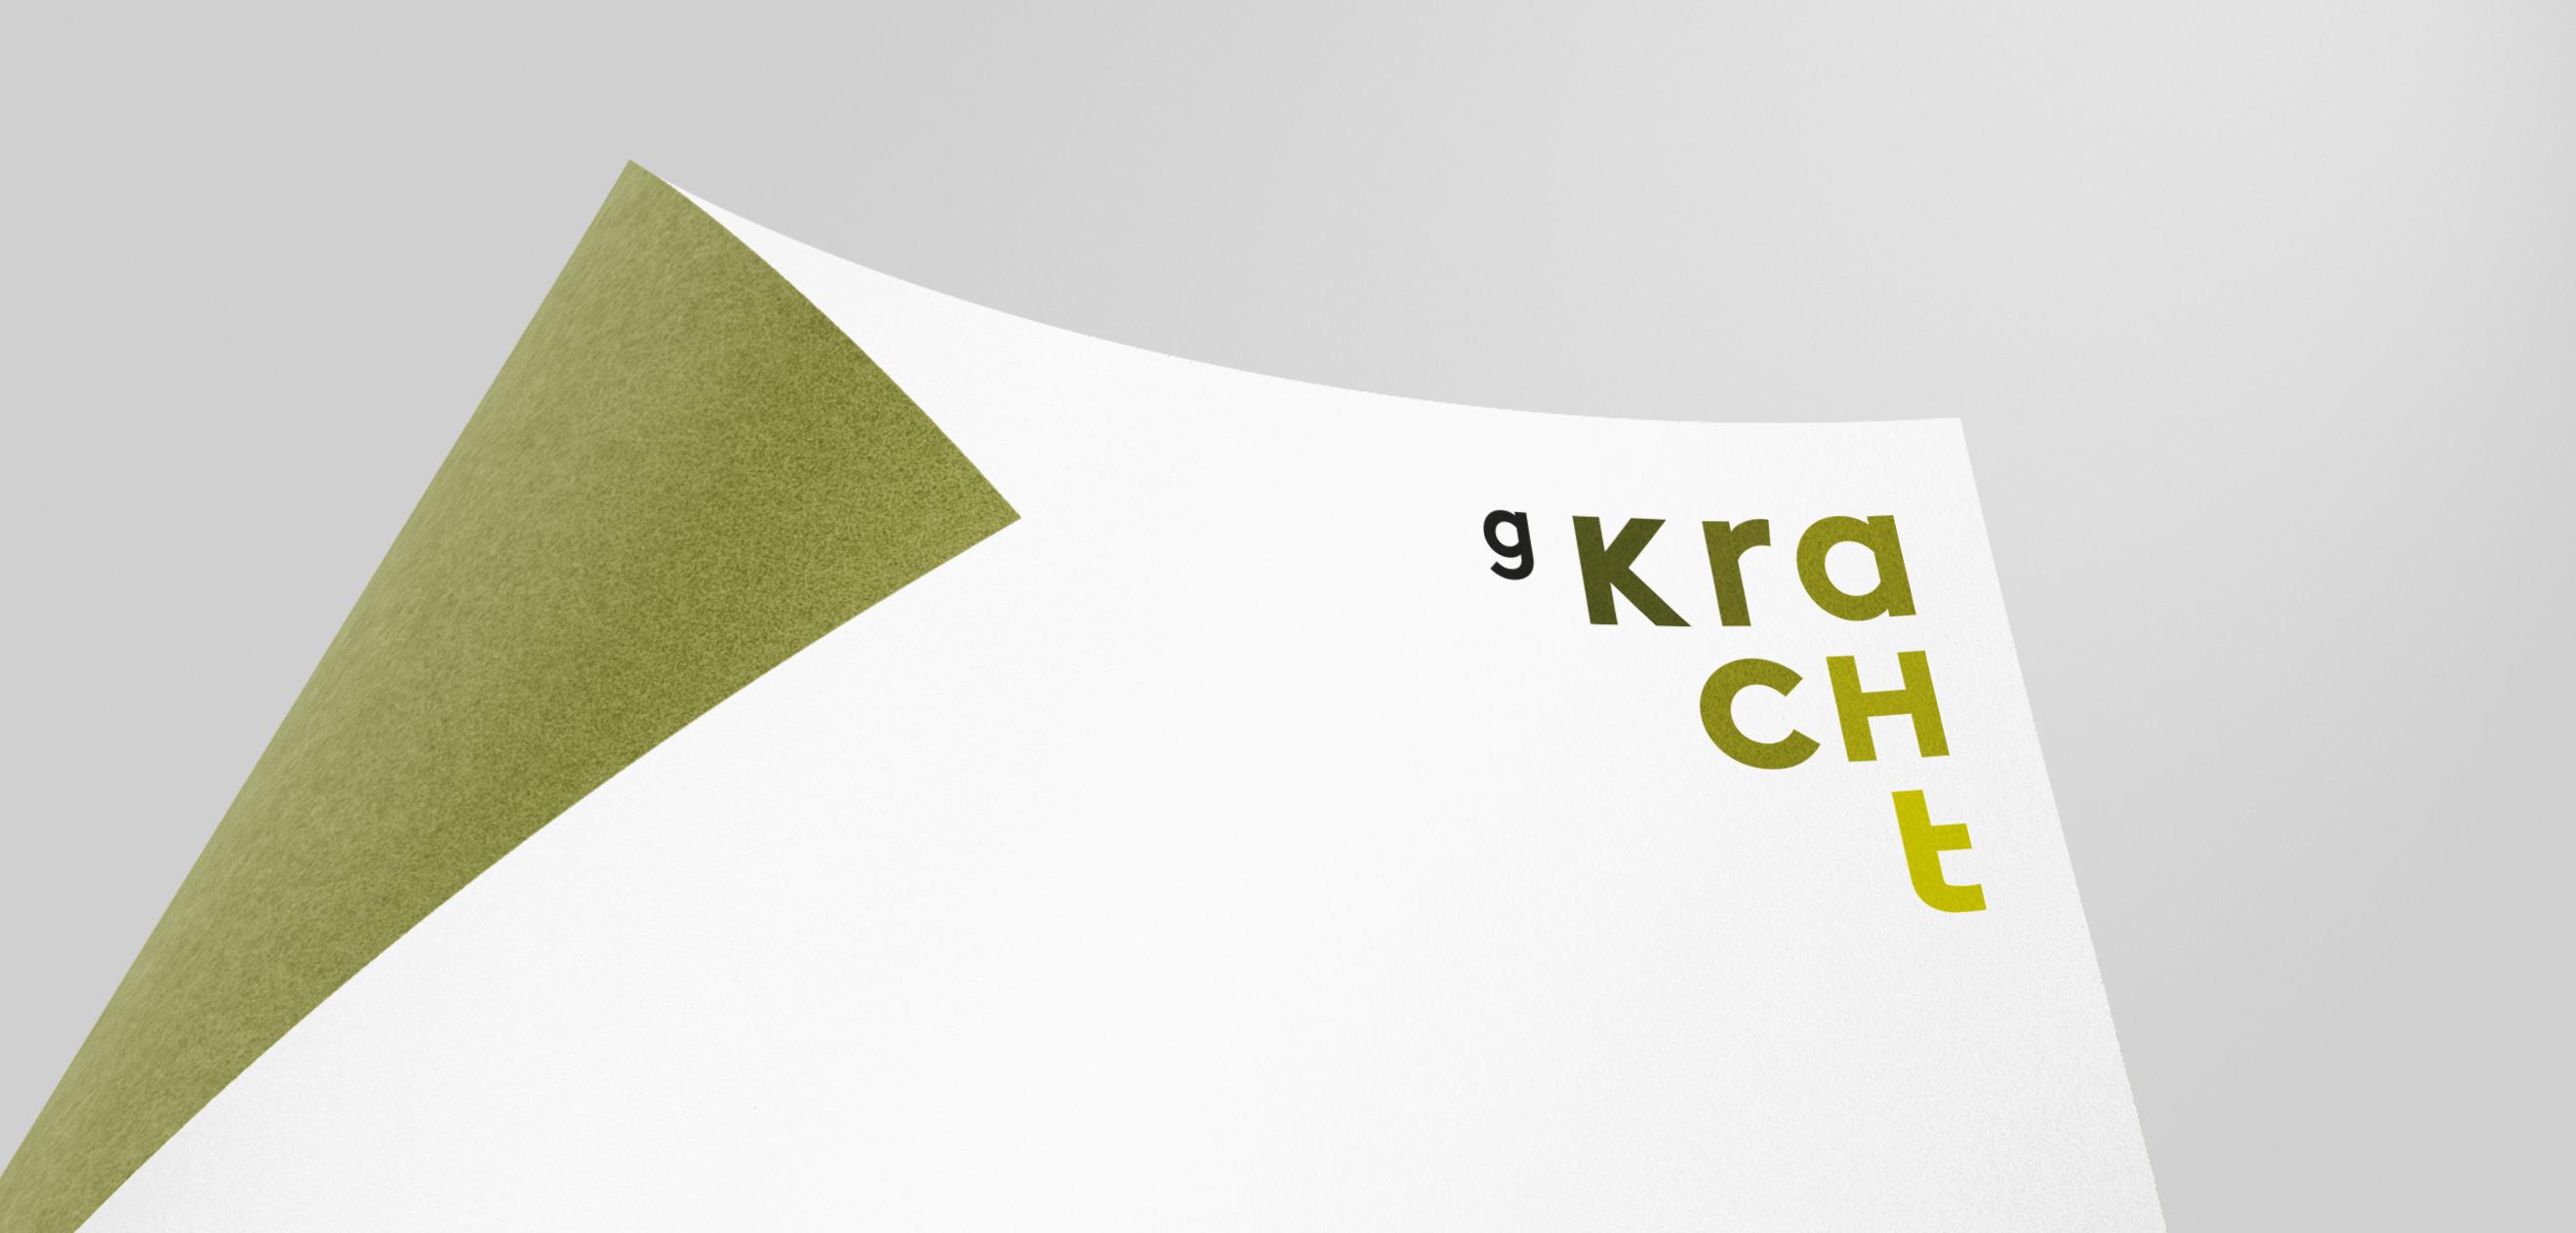 Buro Gkracht, omgevingswet, gemeente, logo, ruimtelijke ordening, grafisch ontwerp, groen, omgeving, identiteit, architectuur, gkracht, briefpapier, letter, bag, tas, architectuur